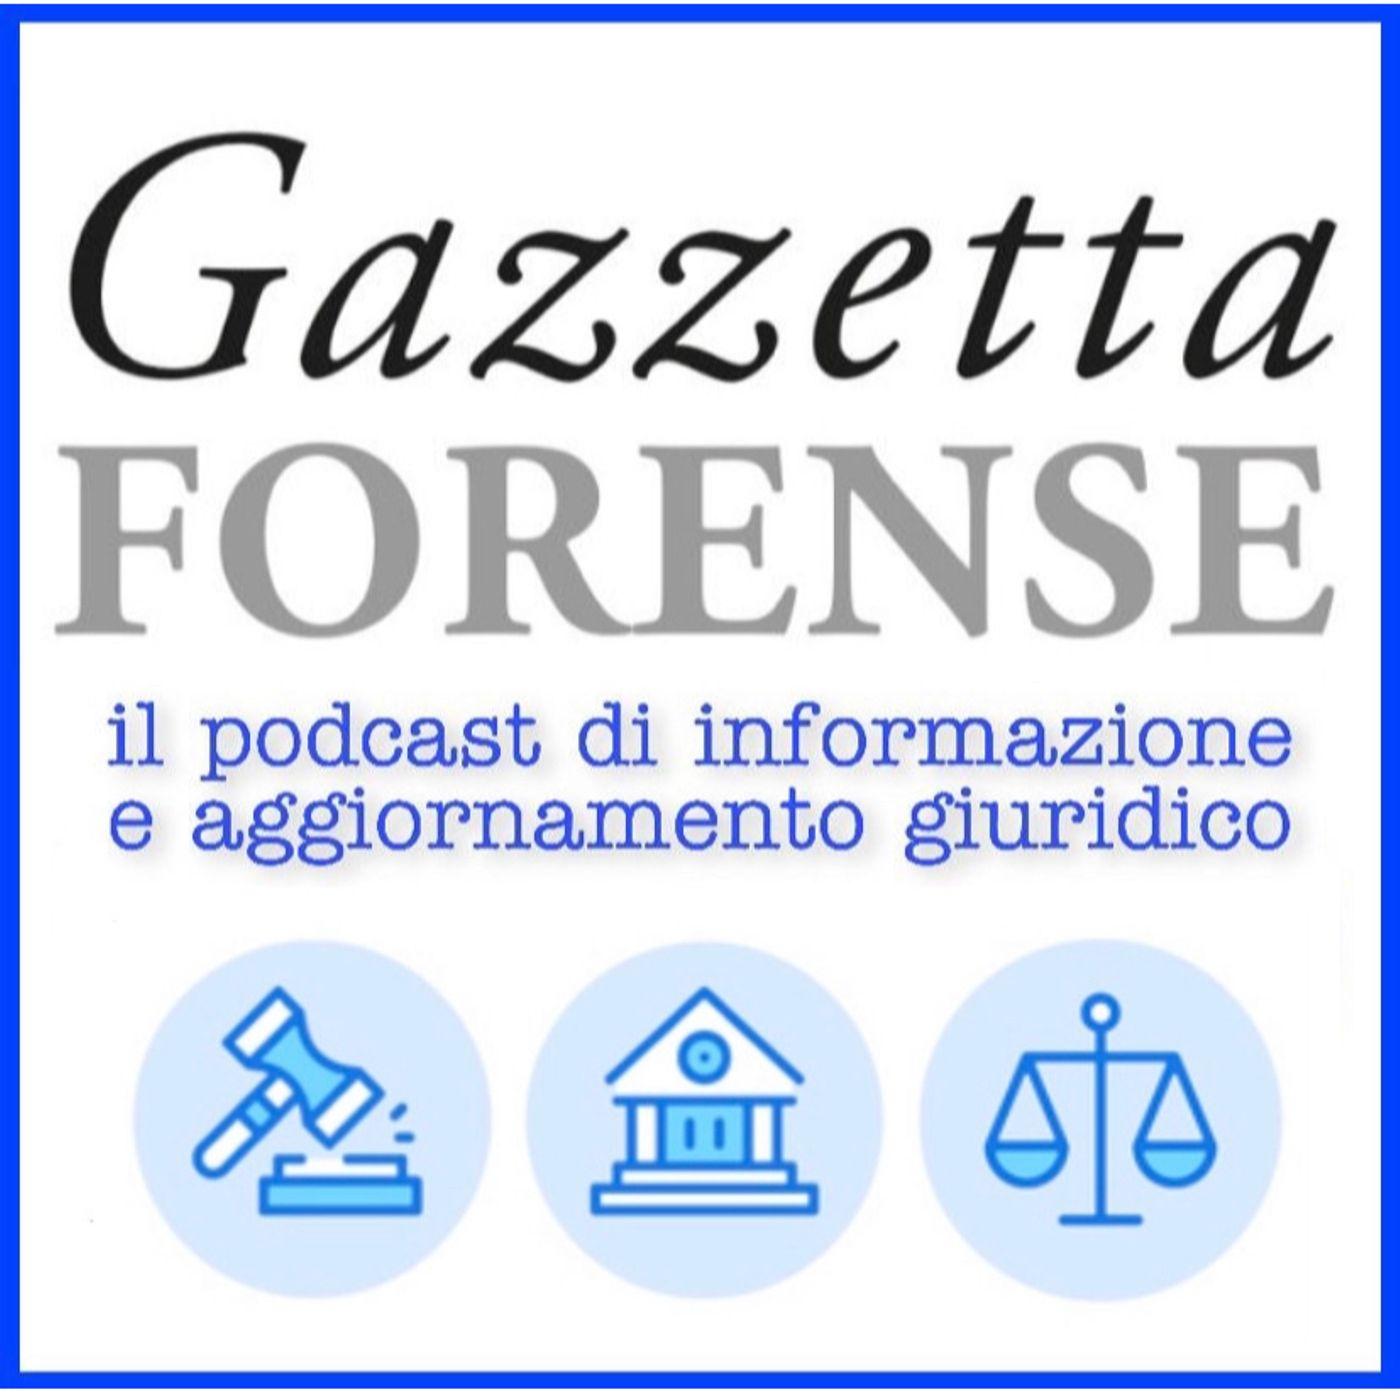 #7 - Gazzetta Forense Podcast